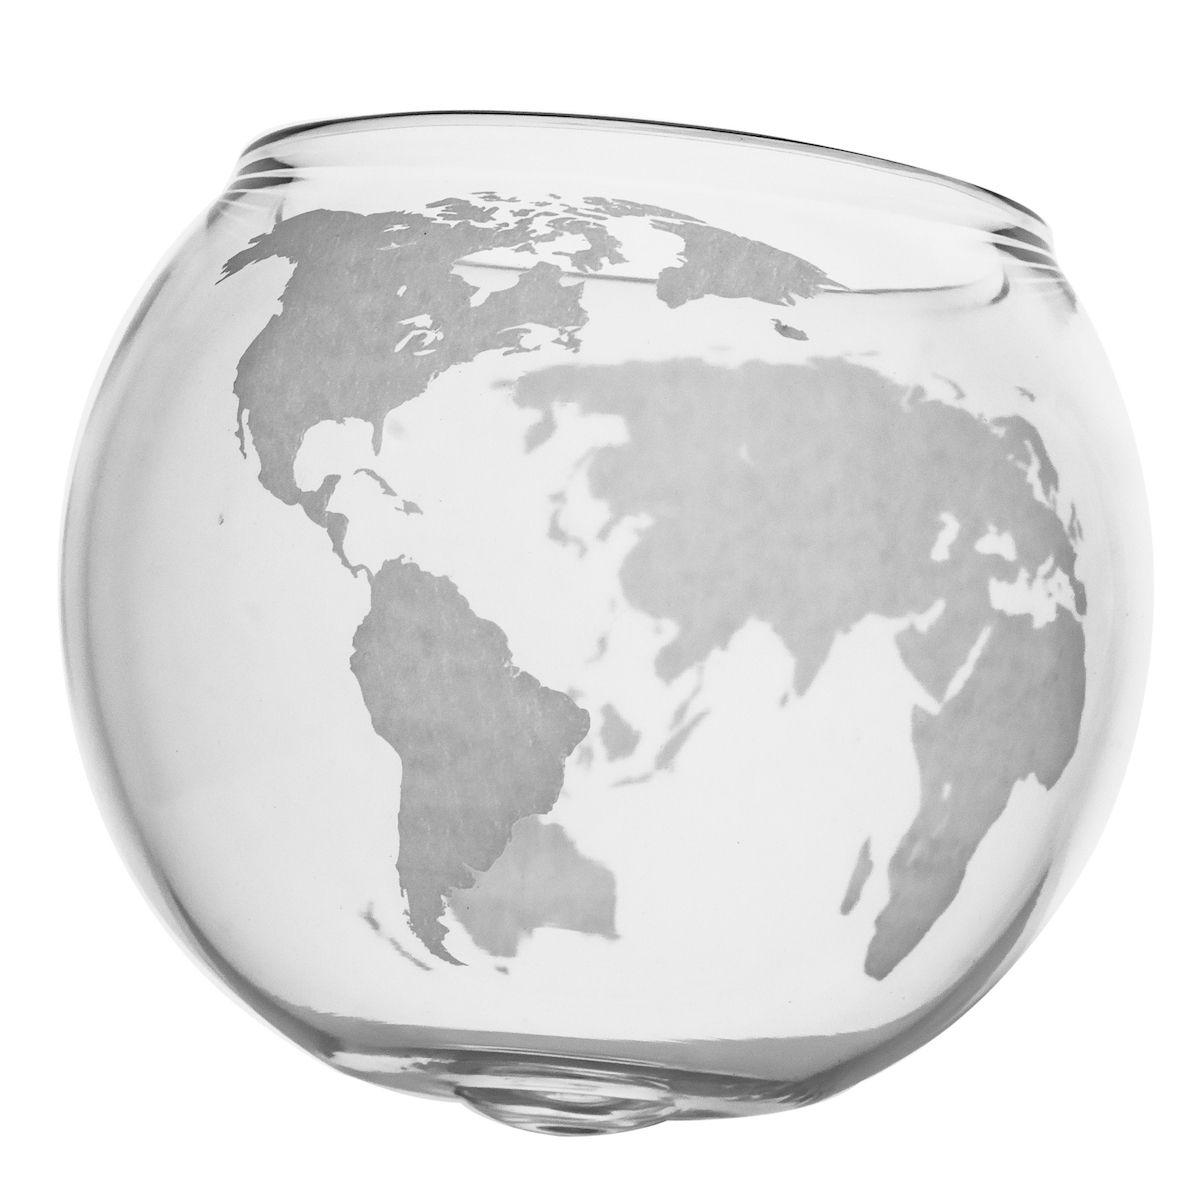 Spinning Globe Whiskey Glasses